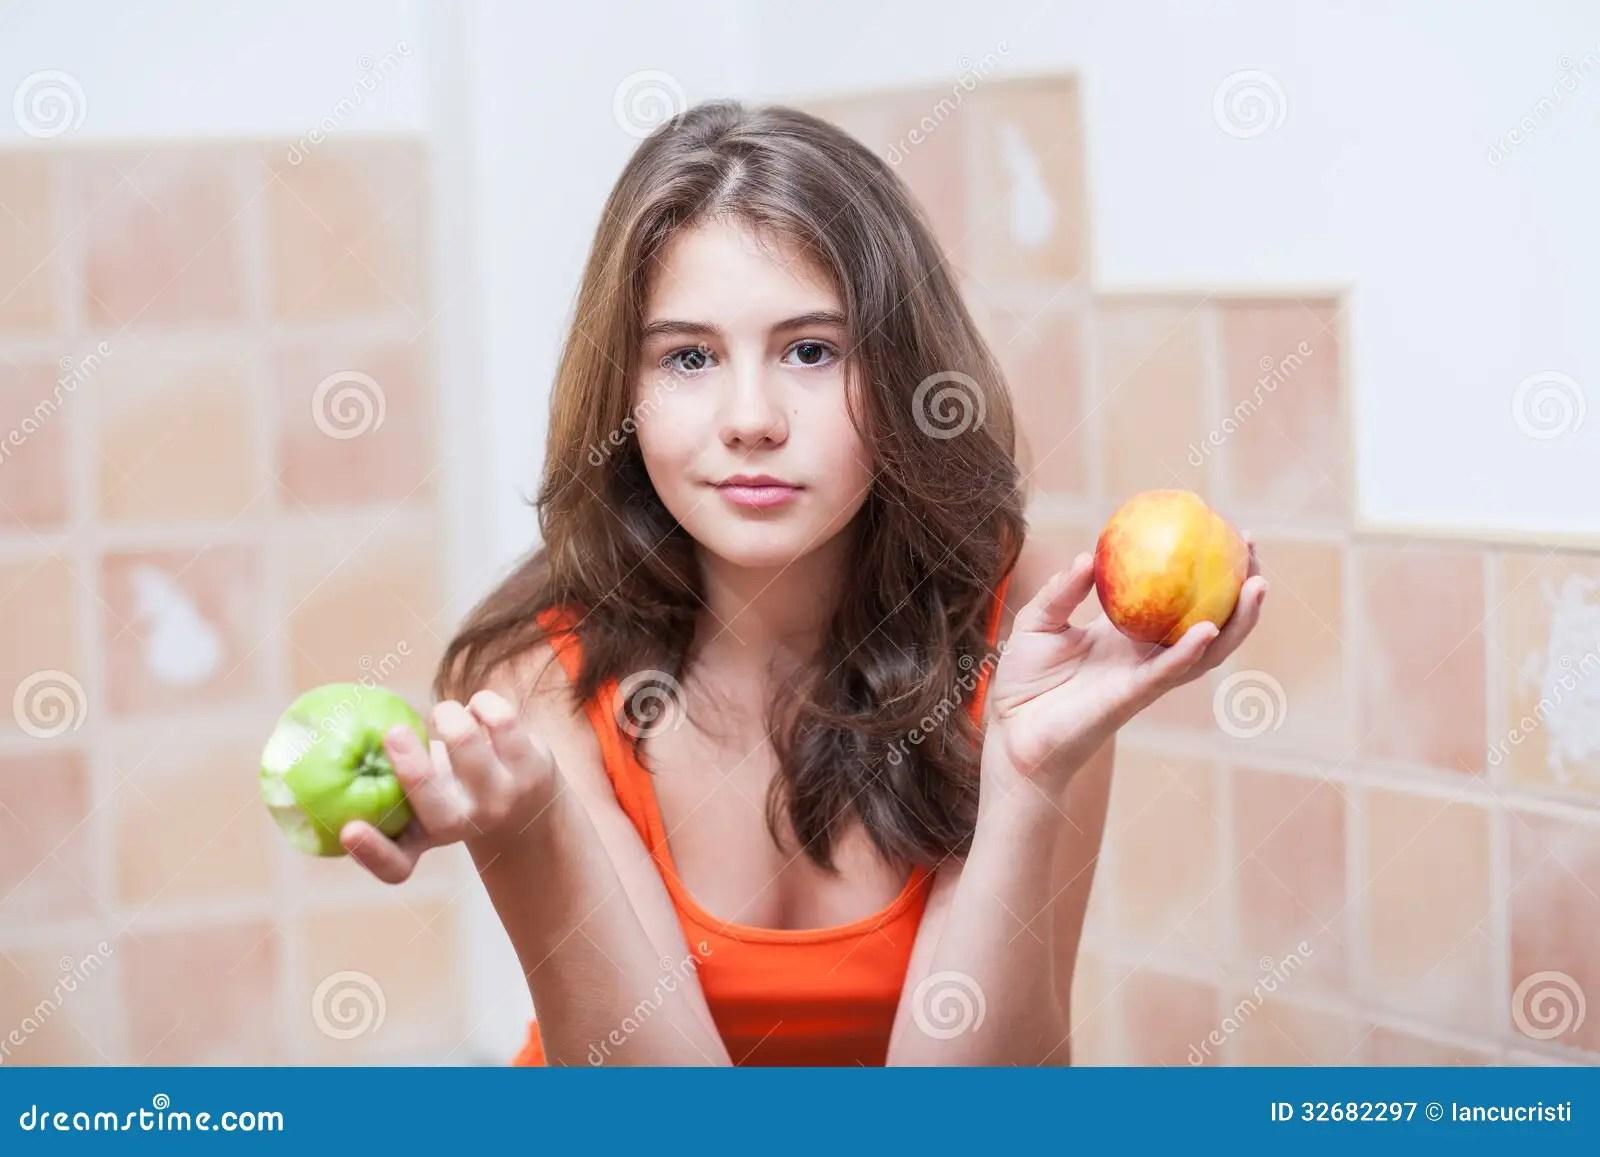 Teenage Girl In Orange T Shirt Looking At Camera Having A